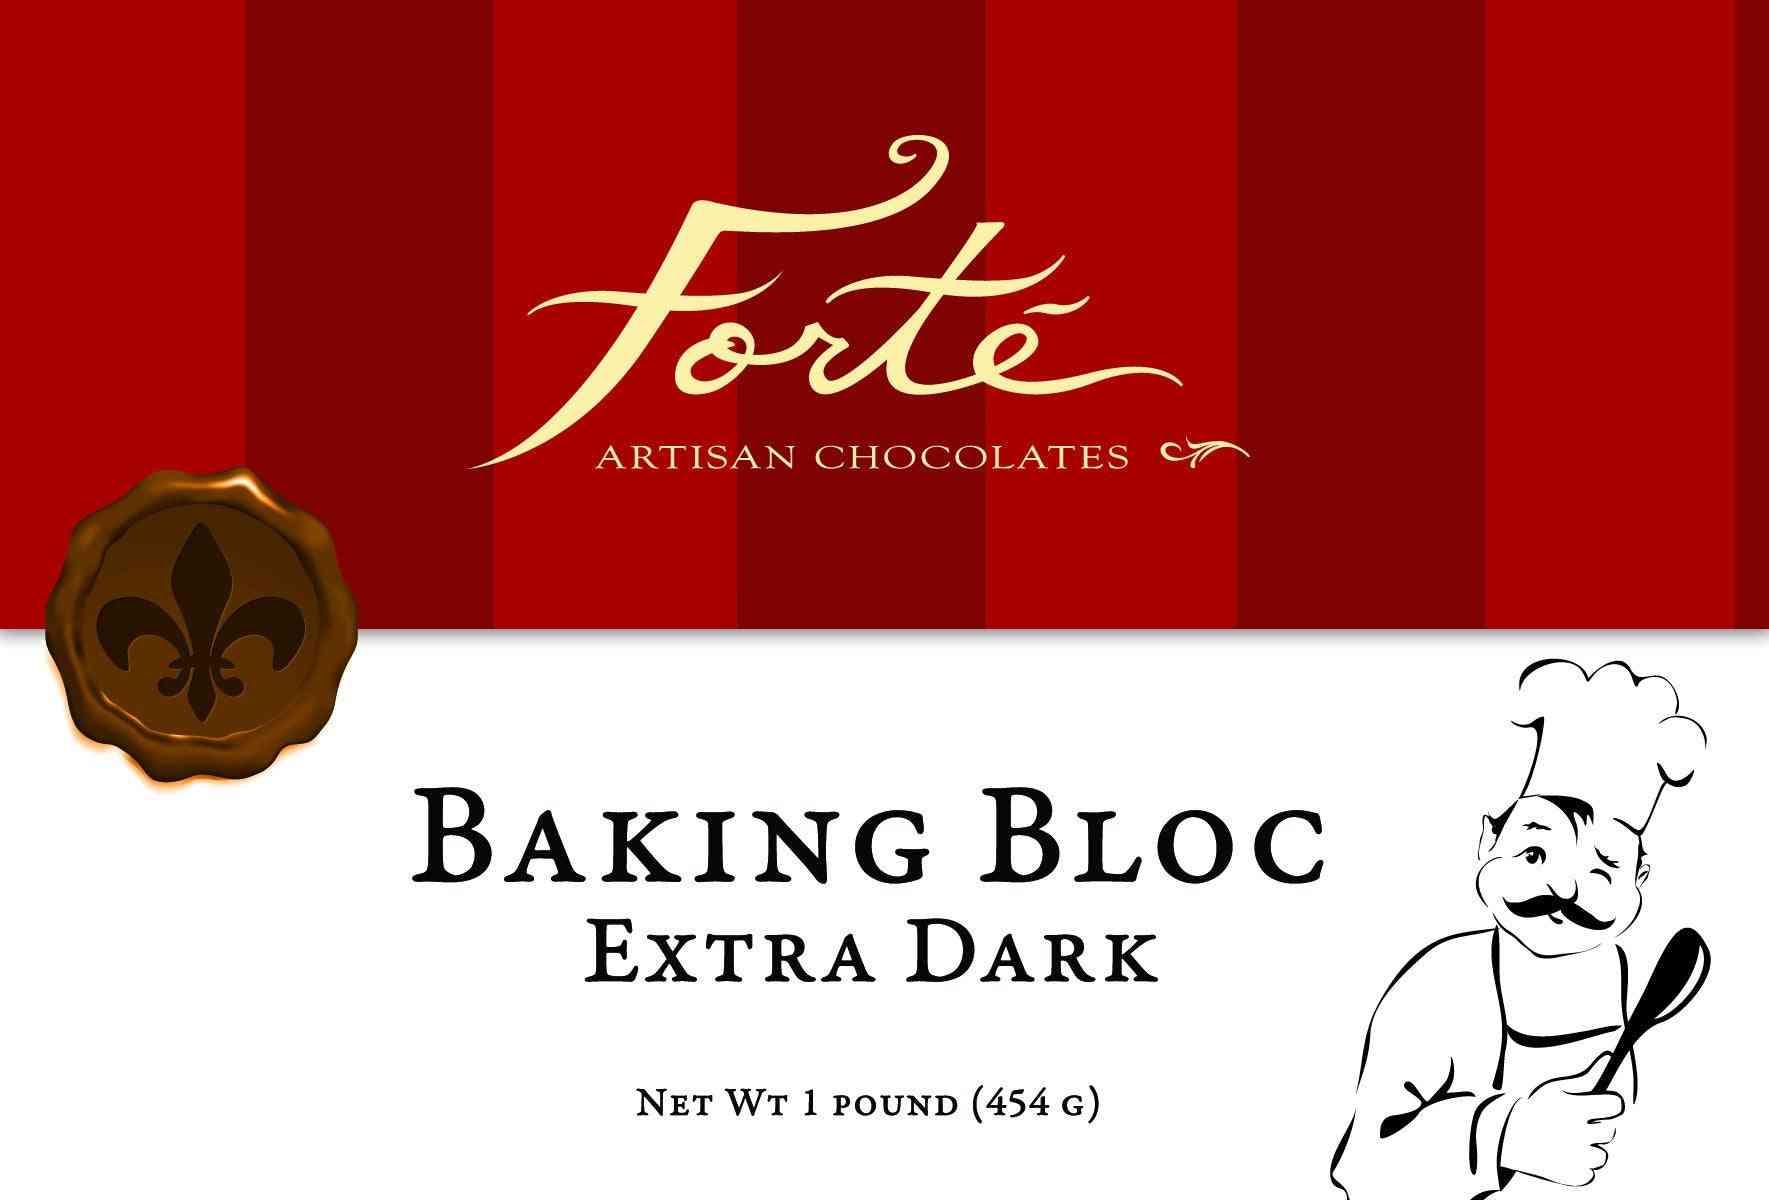 Extra Dark Baking Bloc